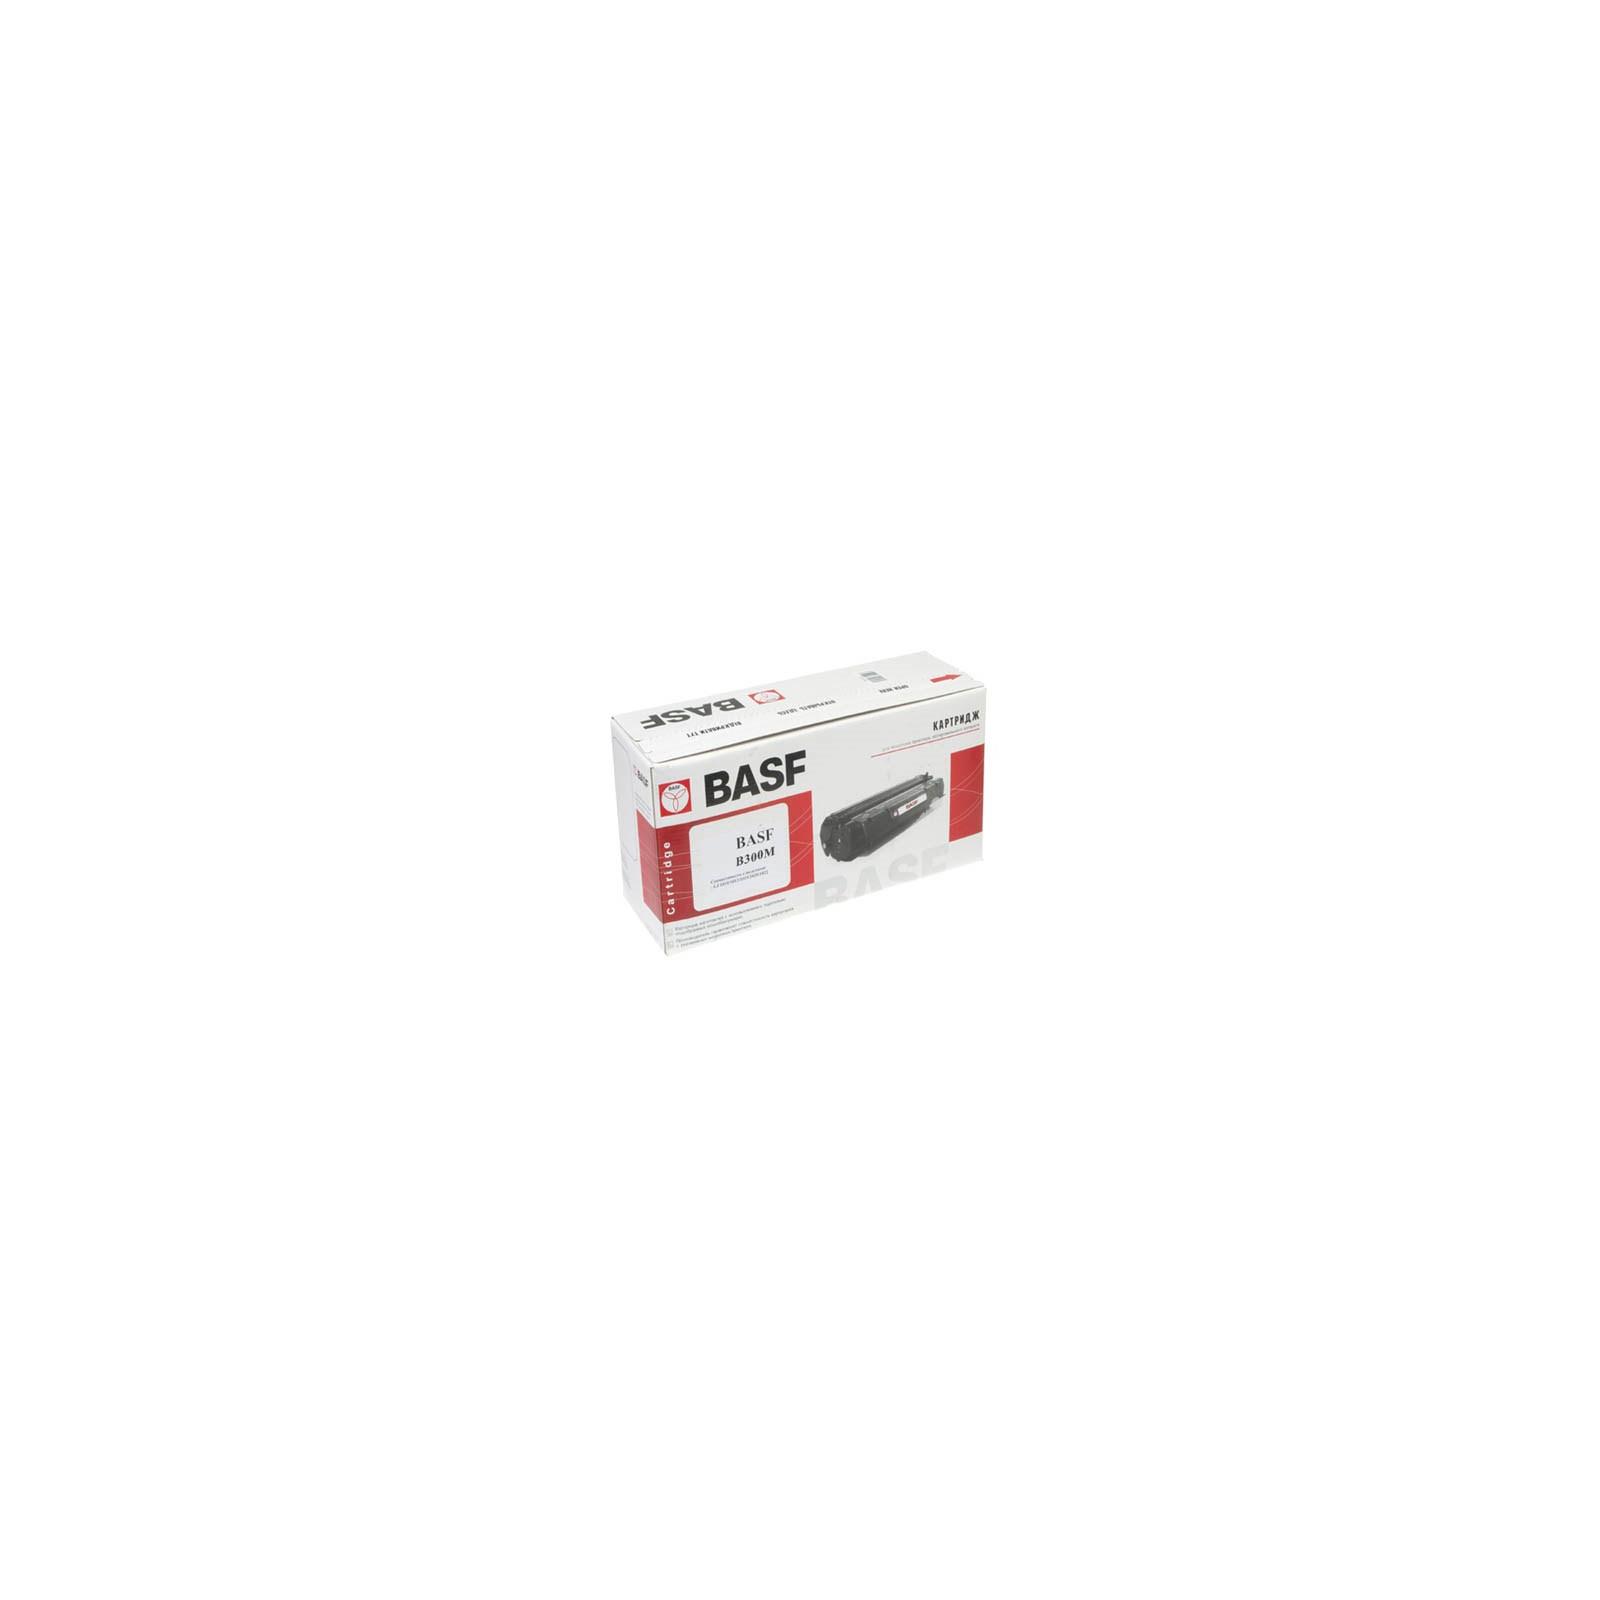 Картридж BASF для Samsung CLP-300/300N//3160 Magenta (B300M)